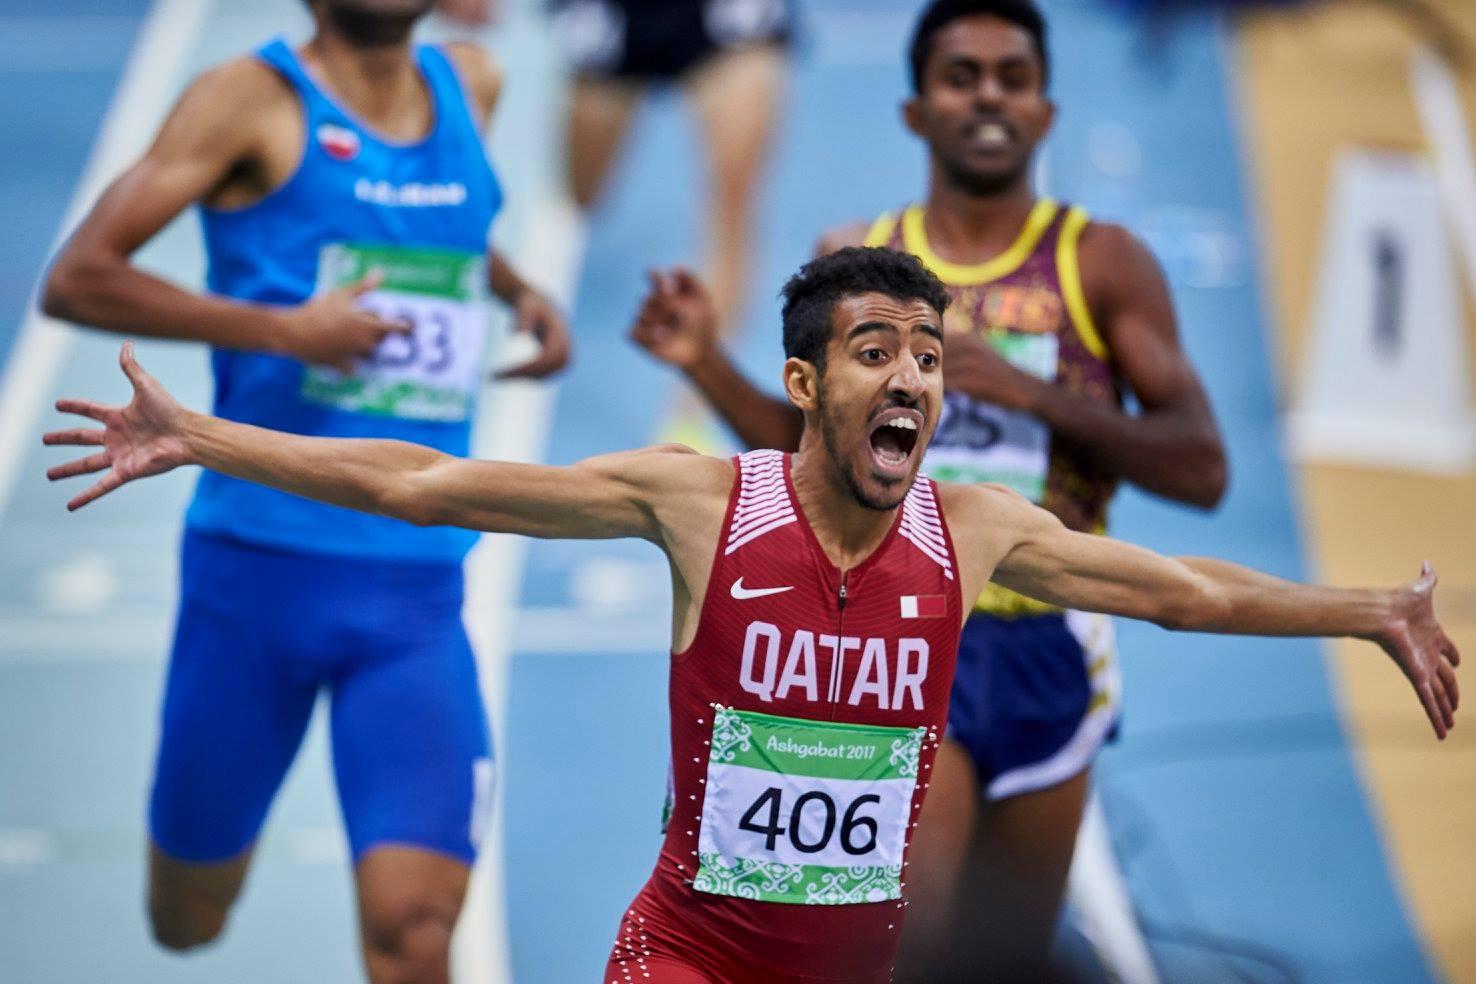 Qatar's Jamal Hairane claimed the men's 800m crown ©Ashgabat 2017/Facebook